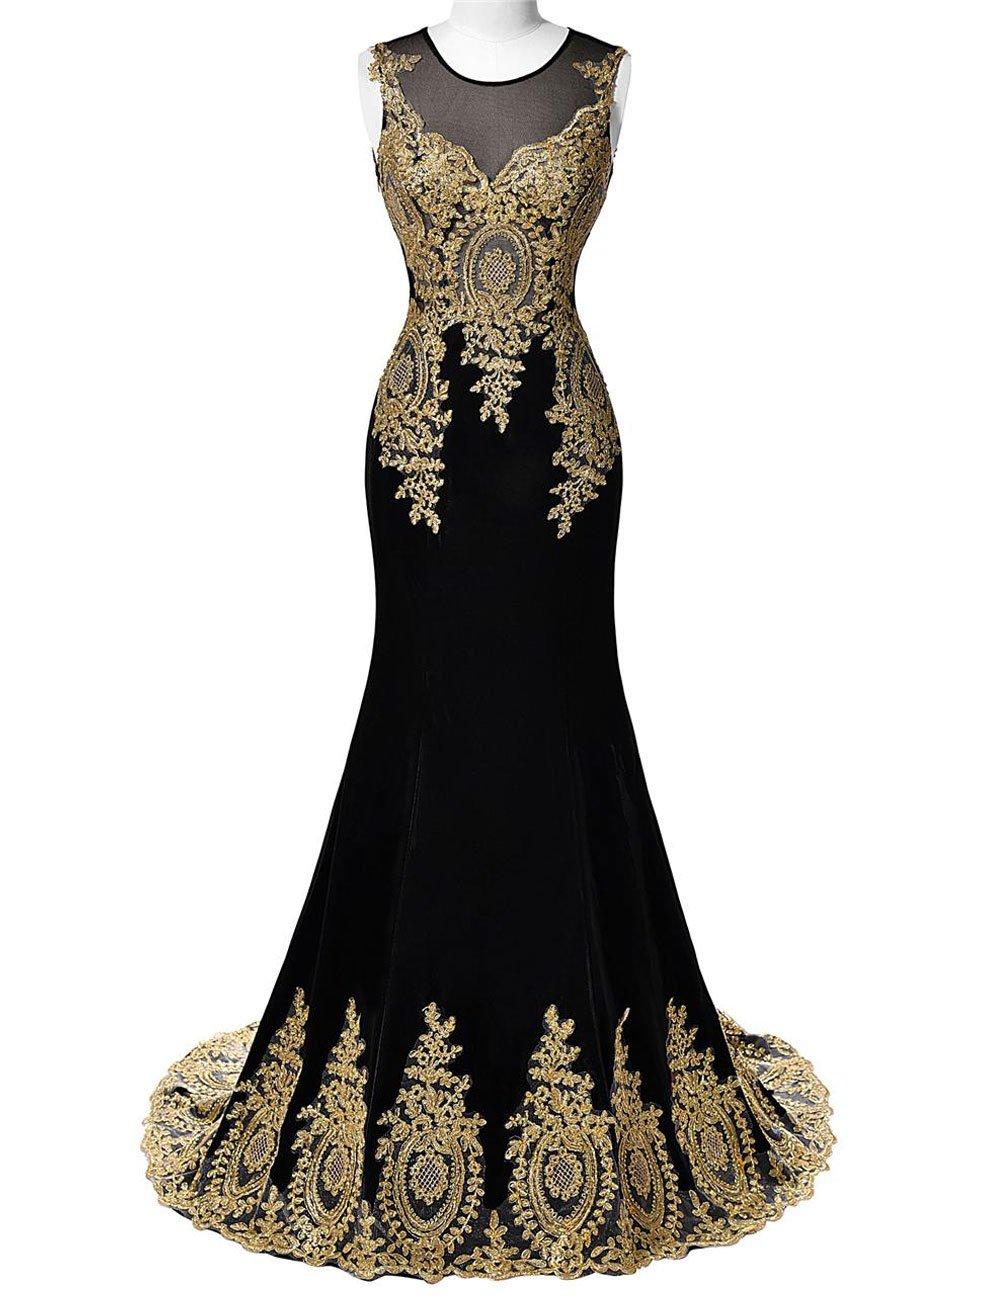 DYS Women's Lace Appliques Mermaid Prom Evening Formal Dresses Illusion Neck Black US 12